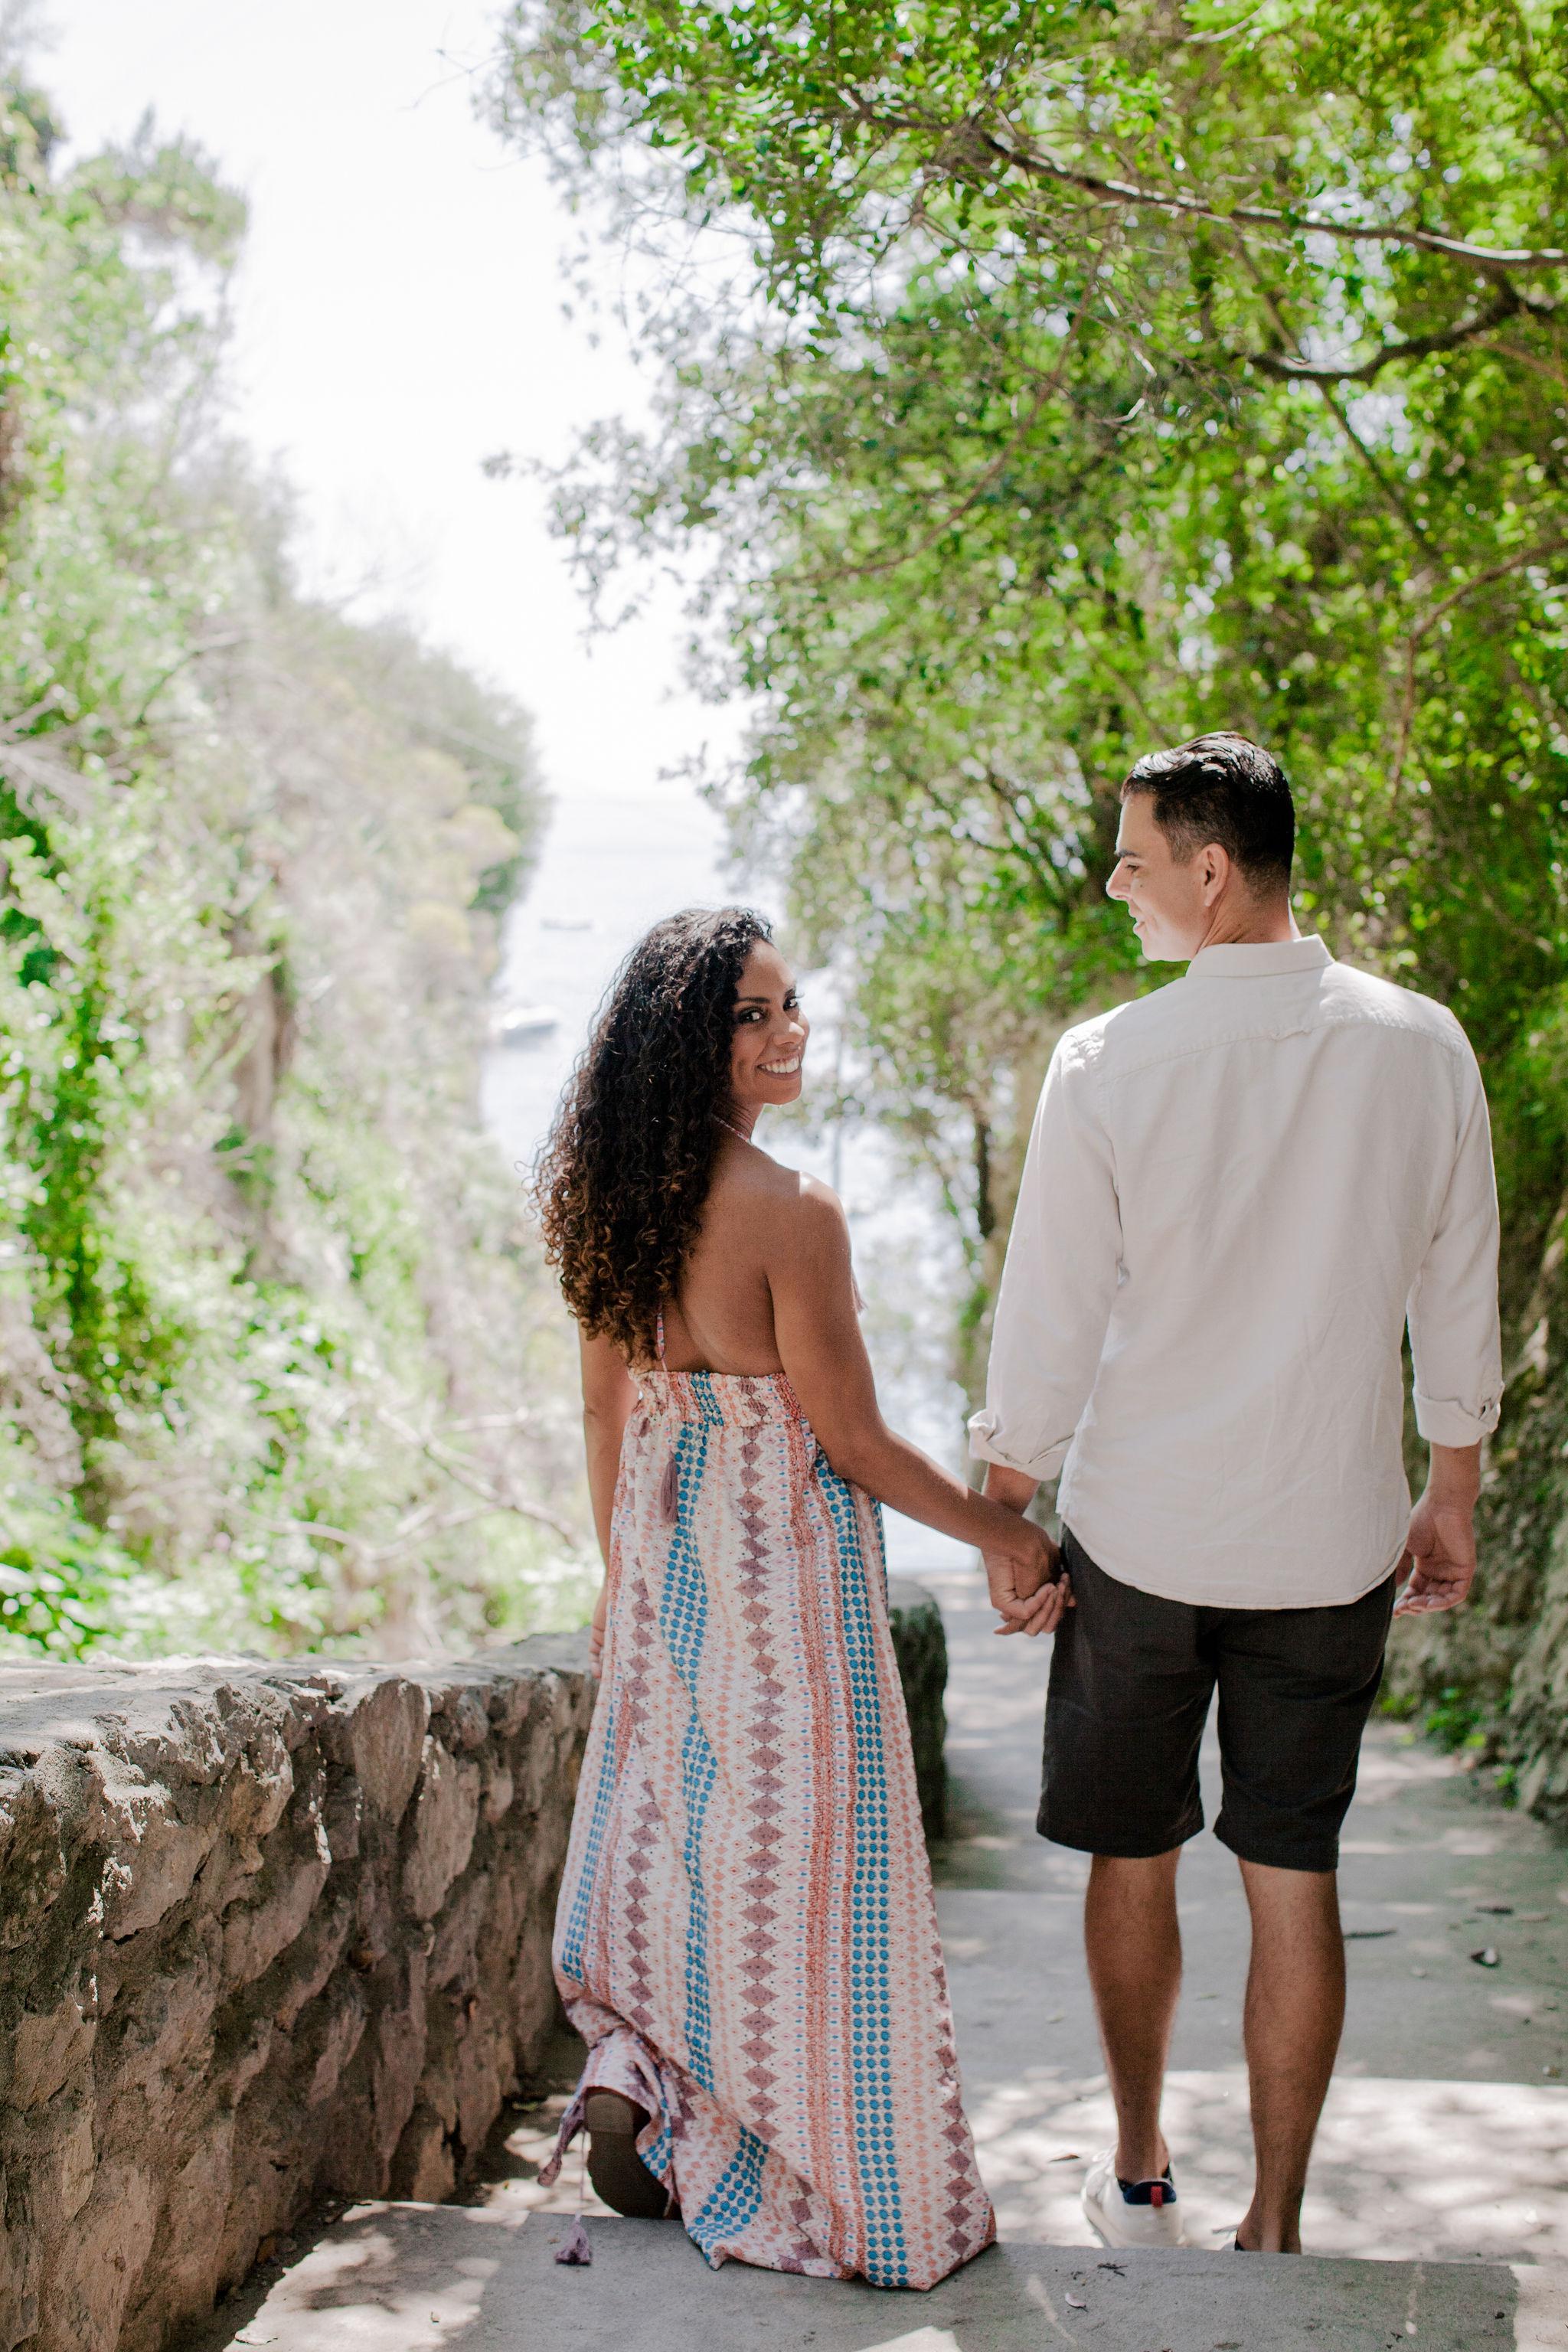 Plan a honeymoon photoshoot